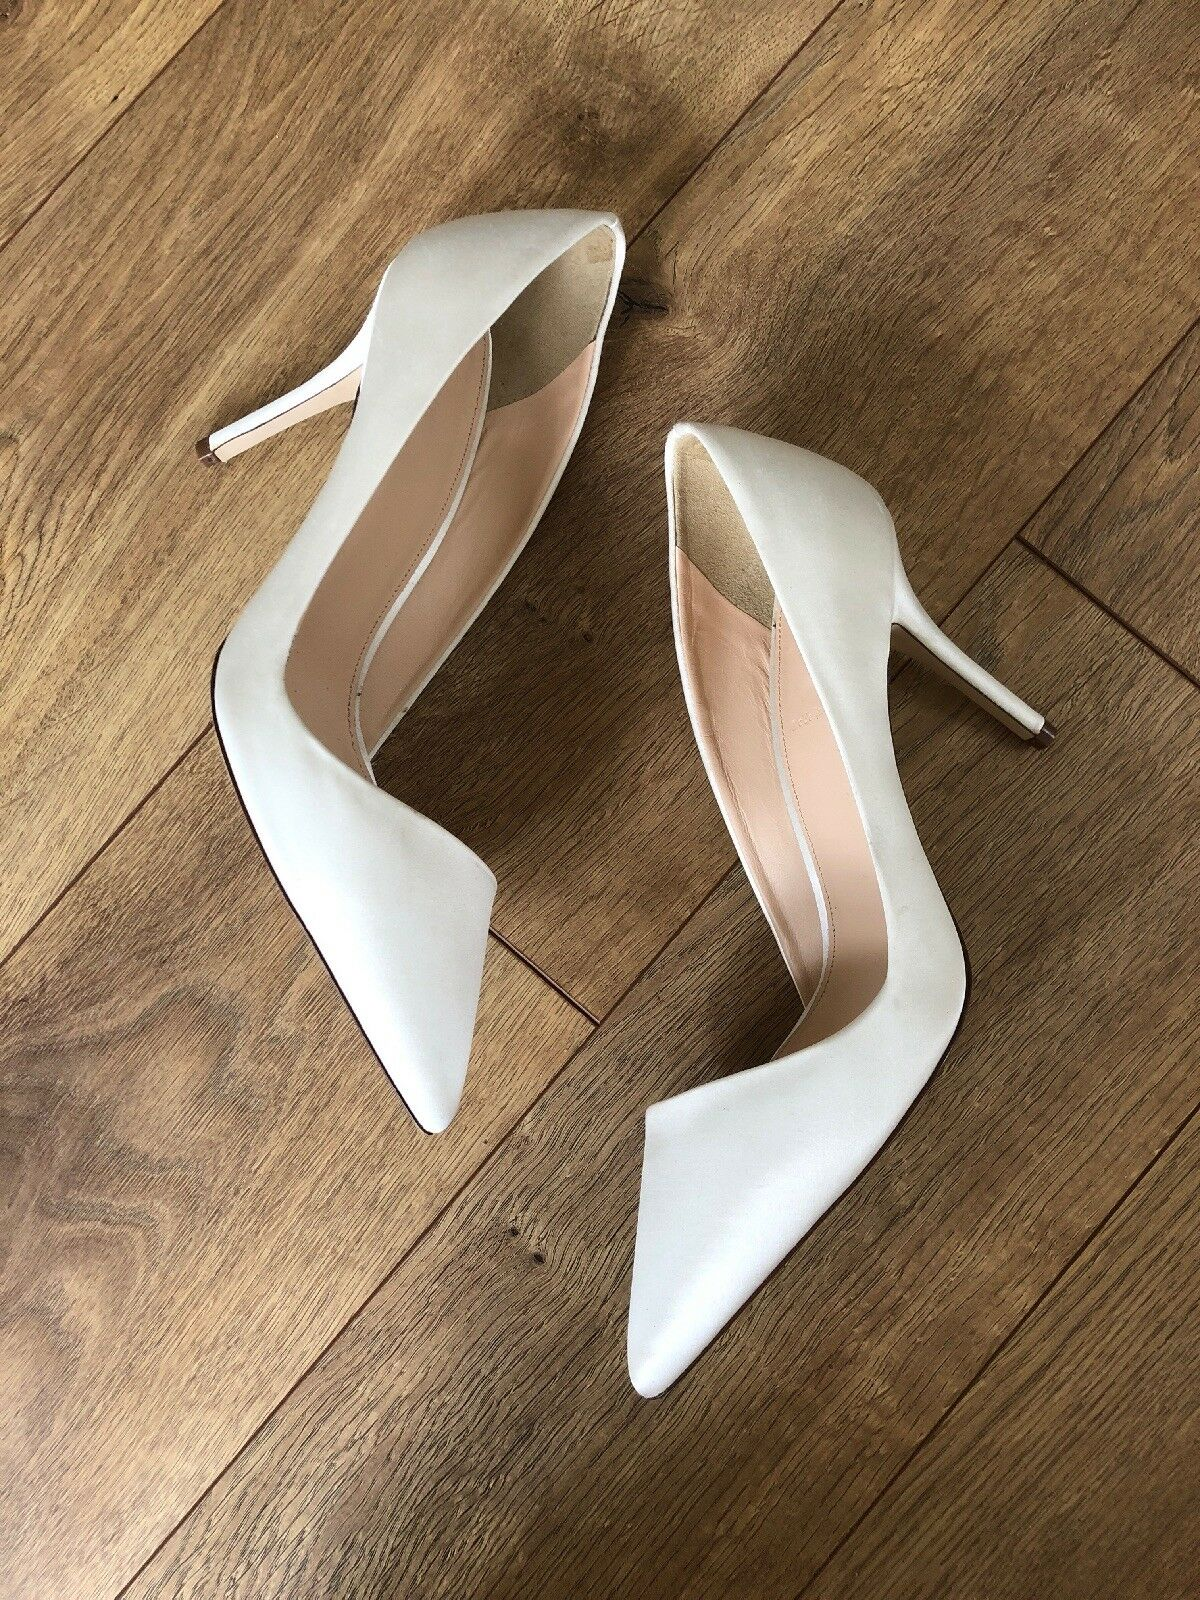 New Jcrew Elsie Elsie Elsie asymmetrical pumps in satin G0883 Size 7 Ivory Wedding shoes 490255